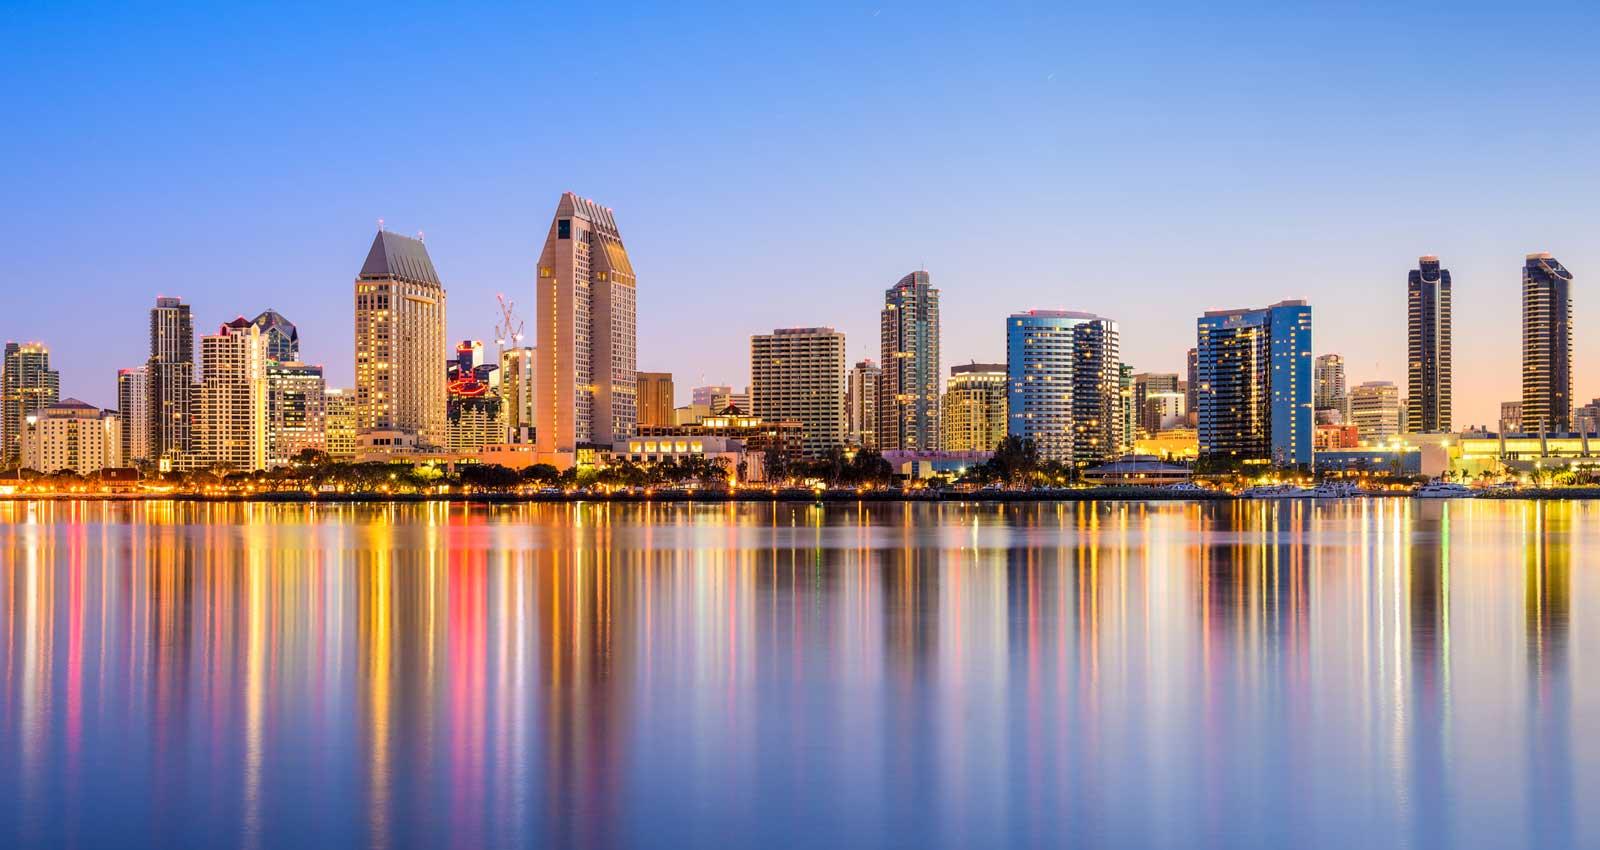 high-rise buildings in San Diego, CA